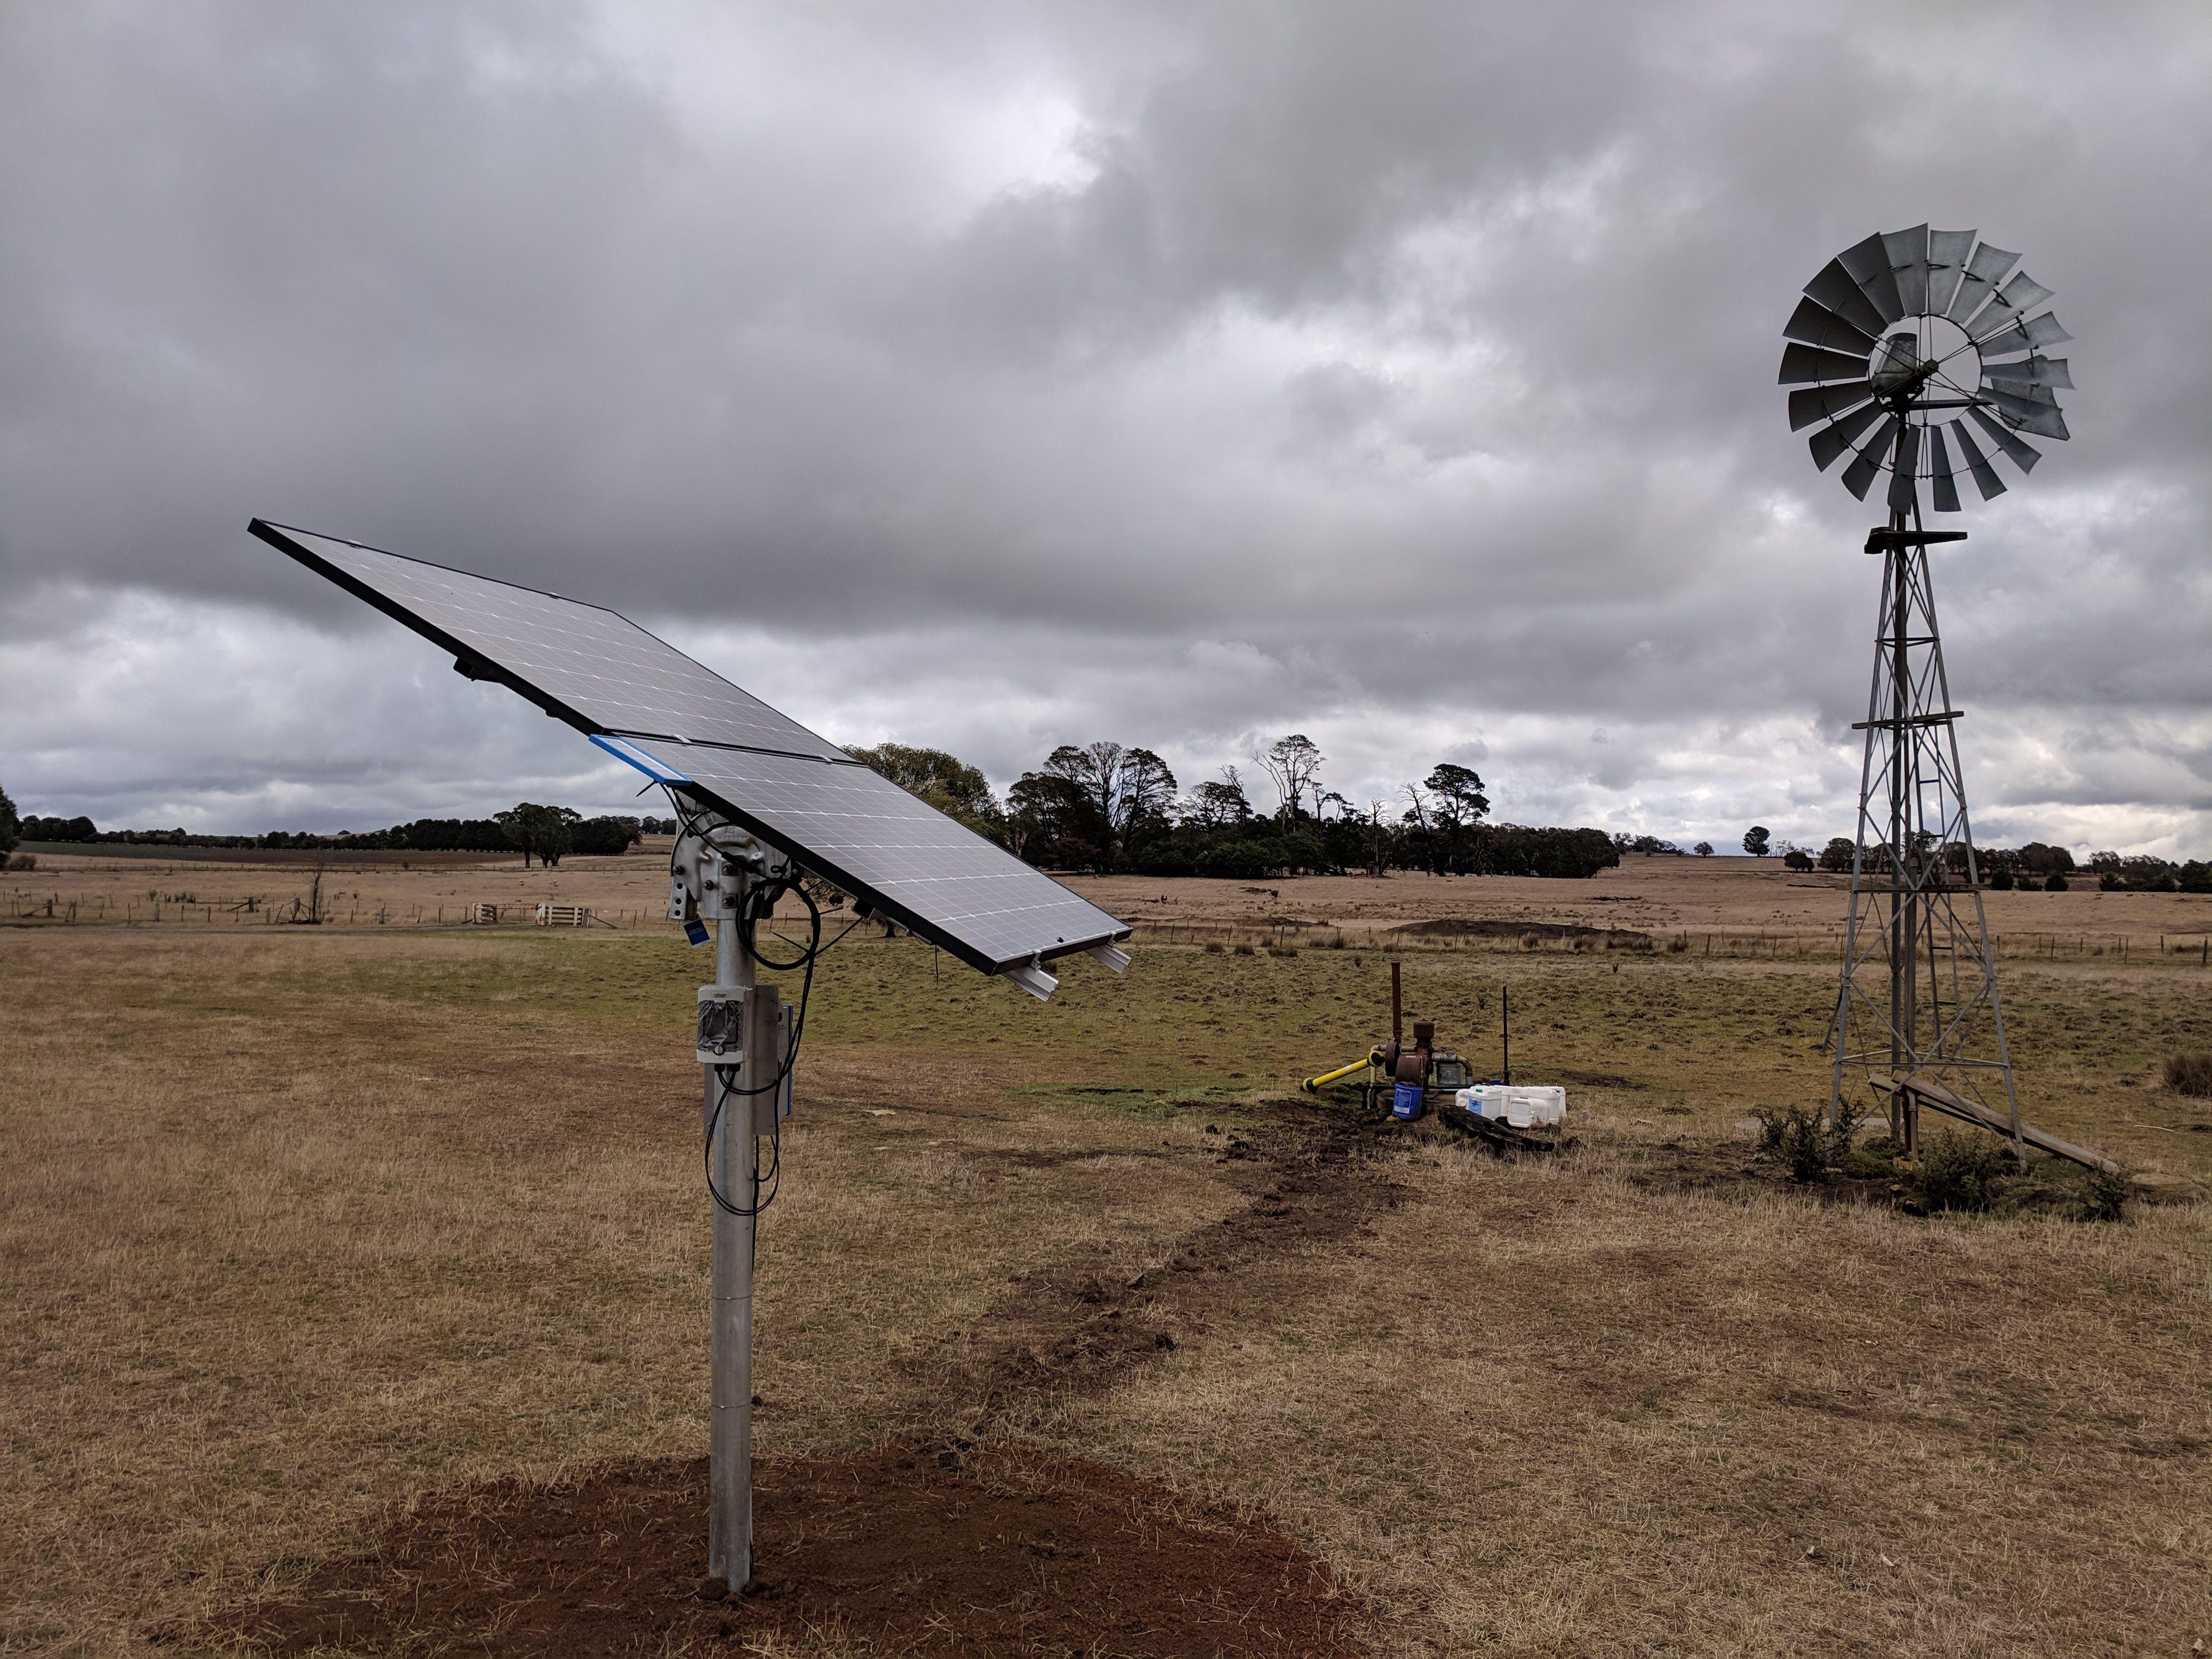 Yalbraith, Australia, March 2019